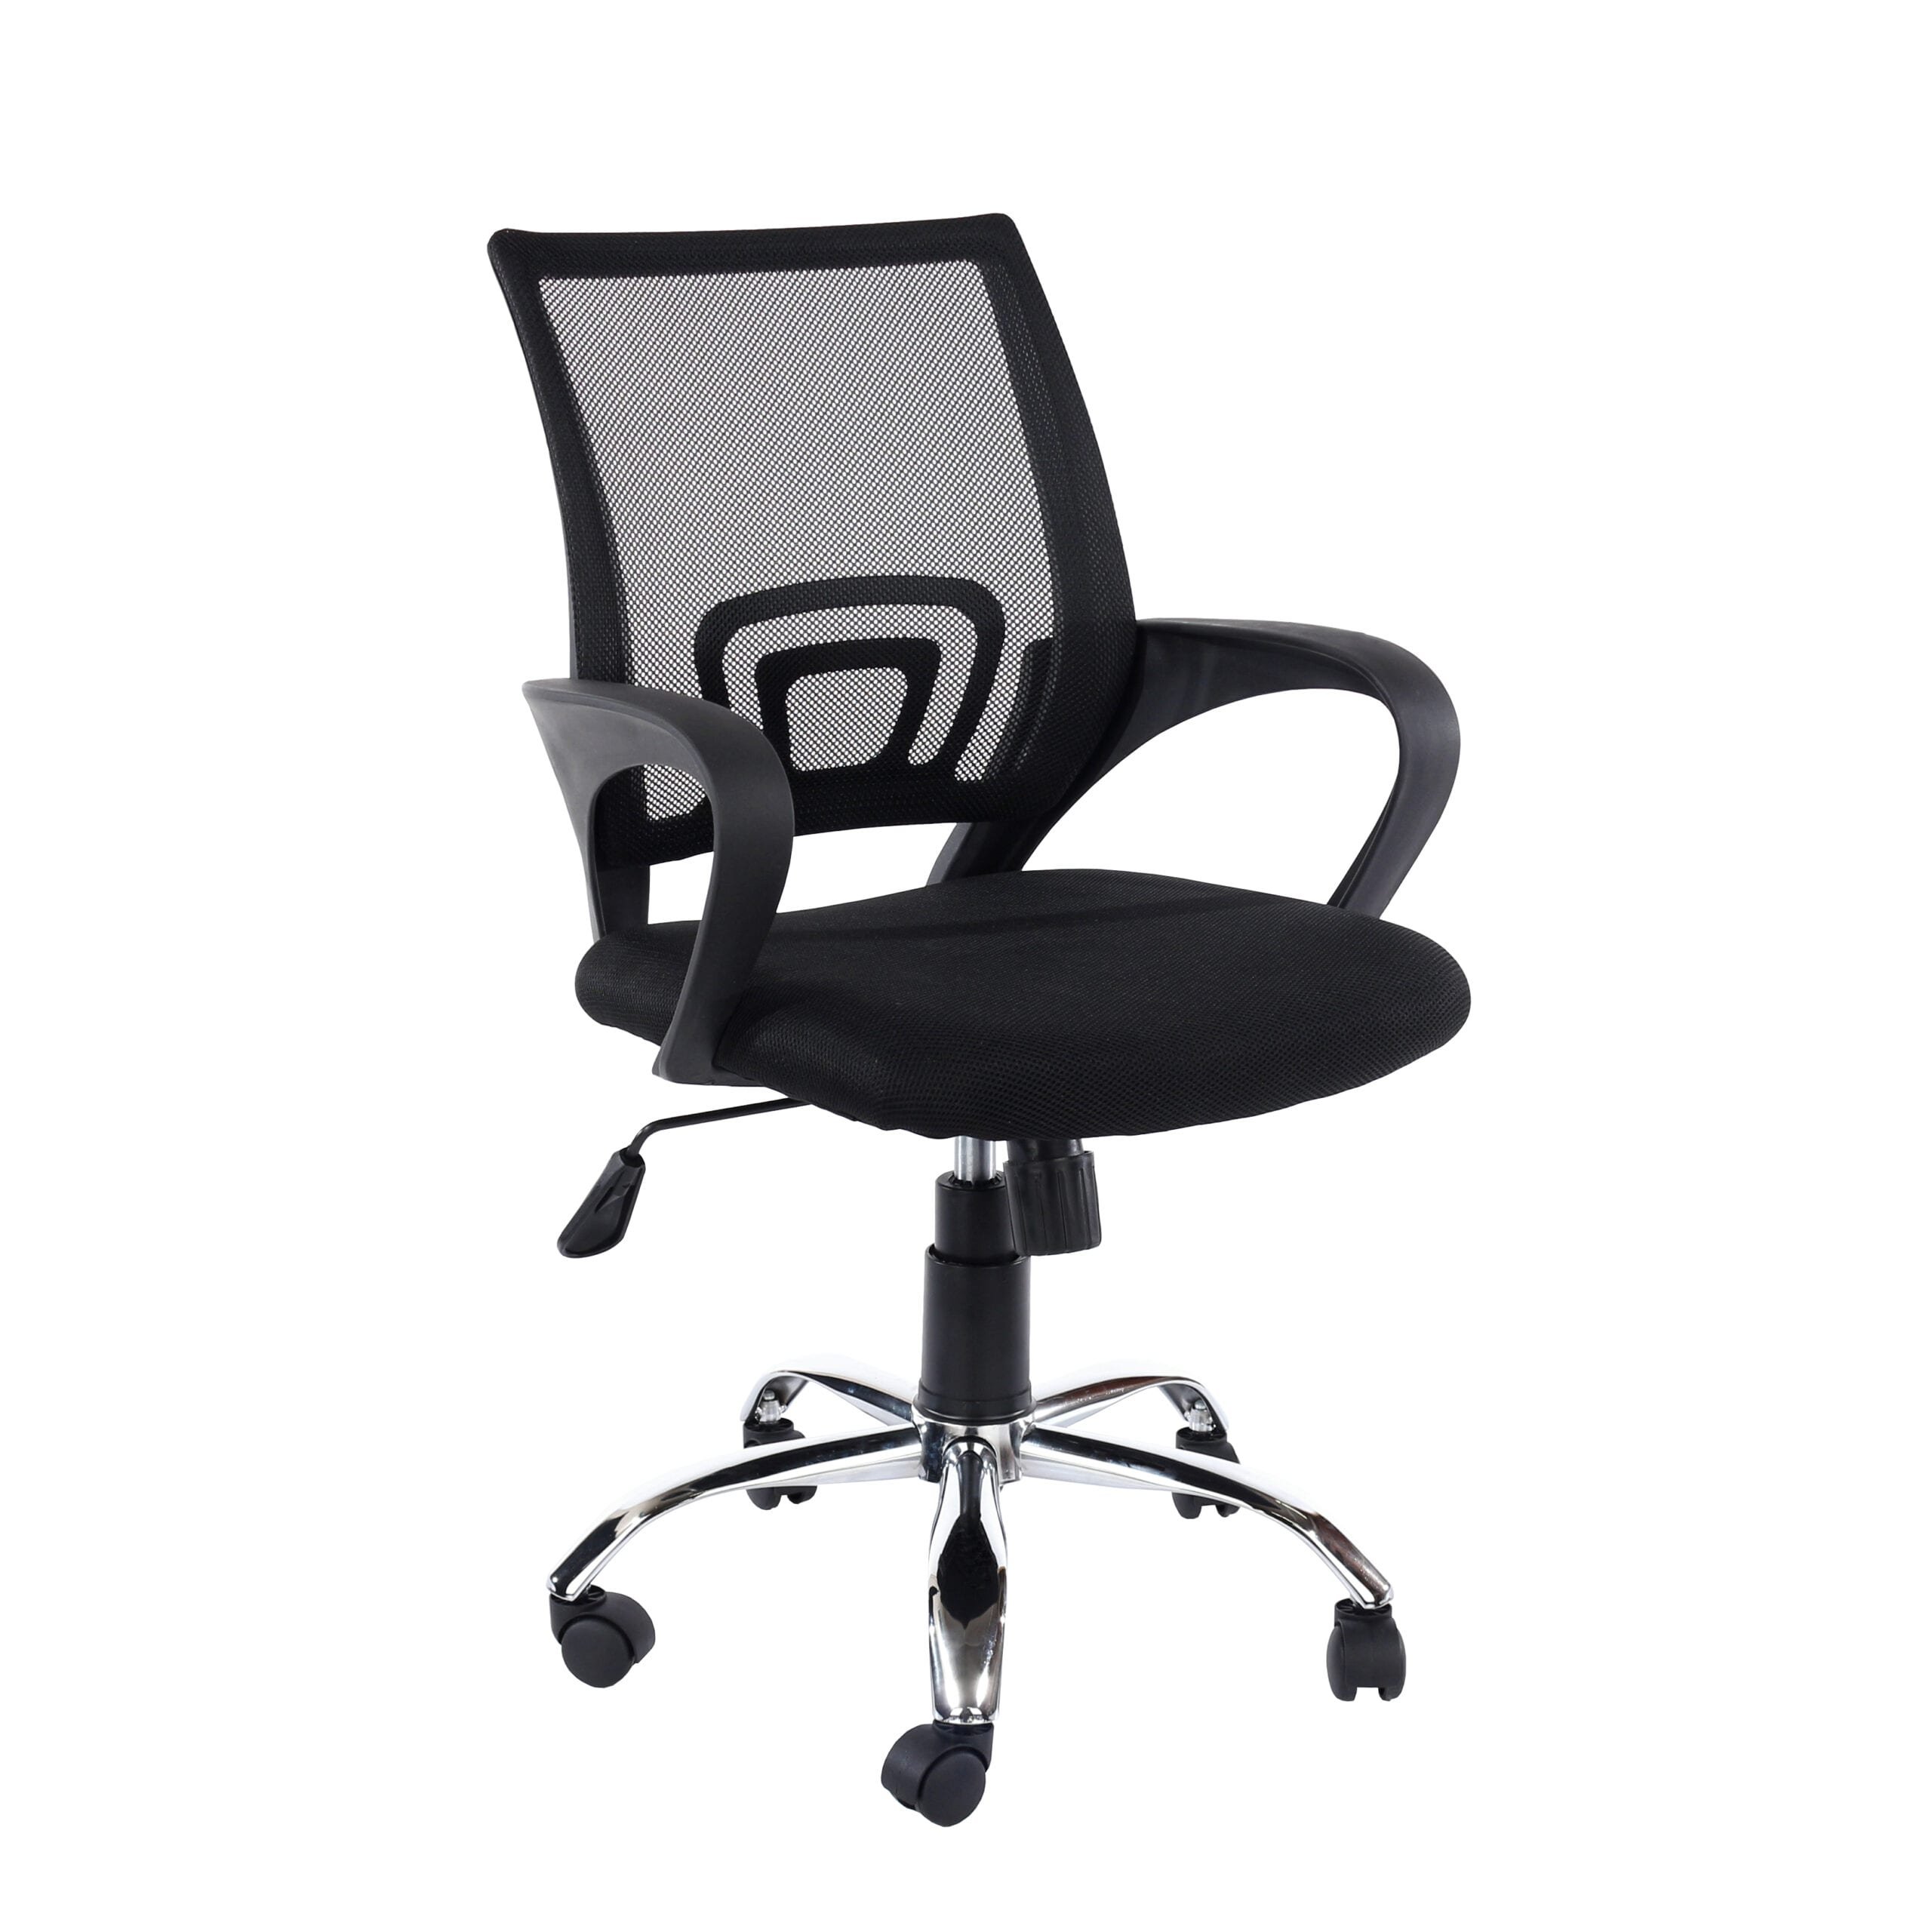 Lust study chair in black mesh back